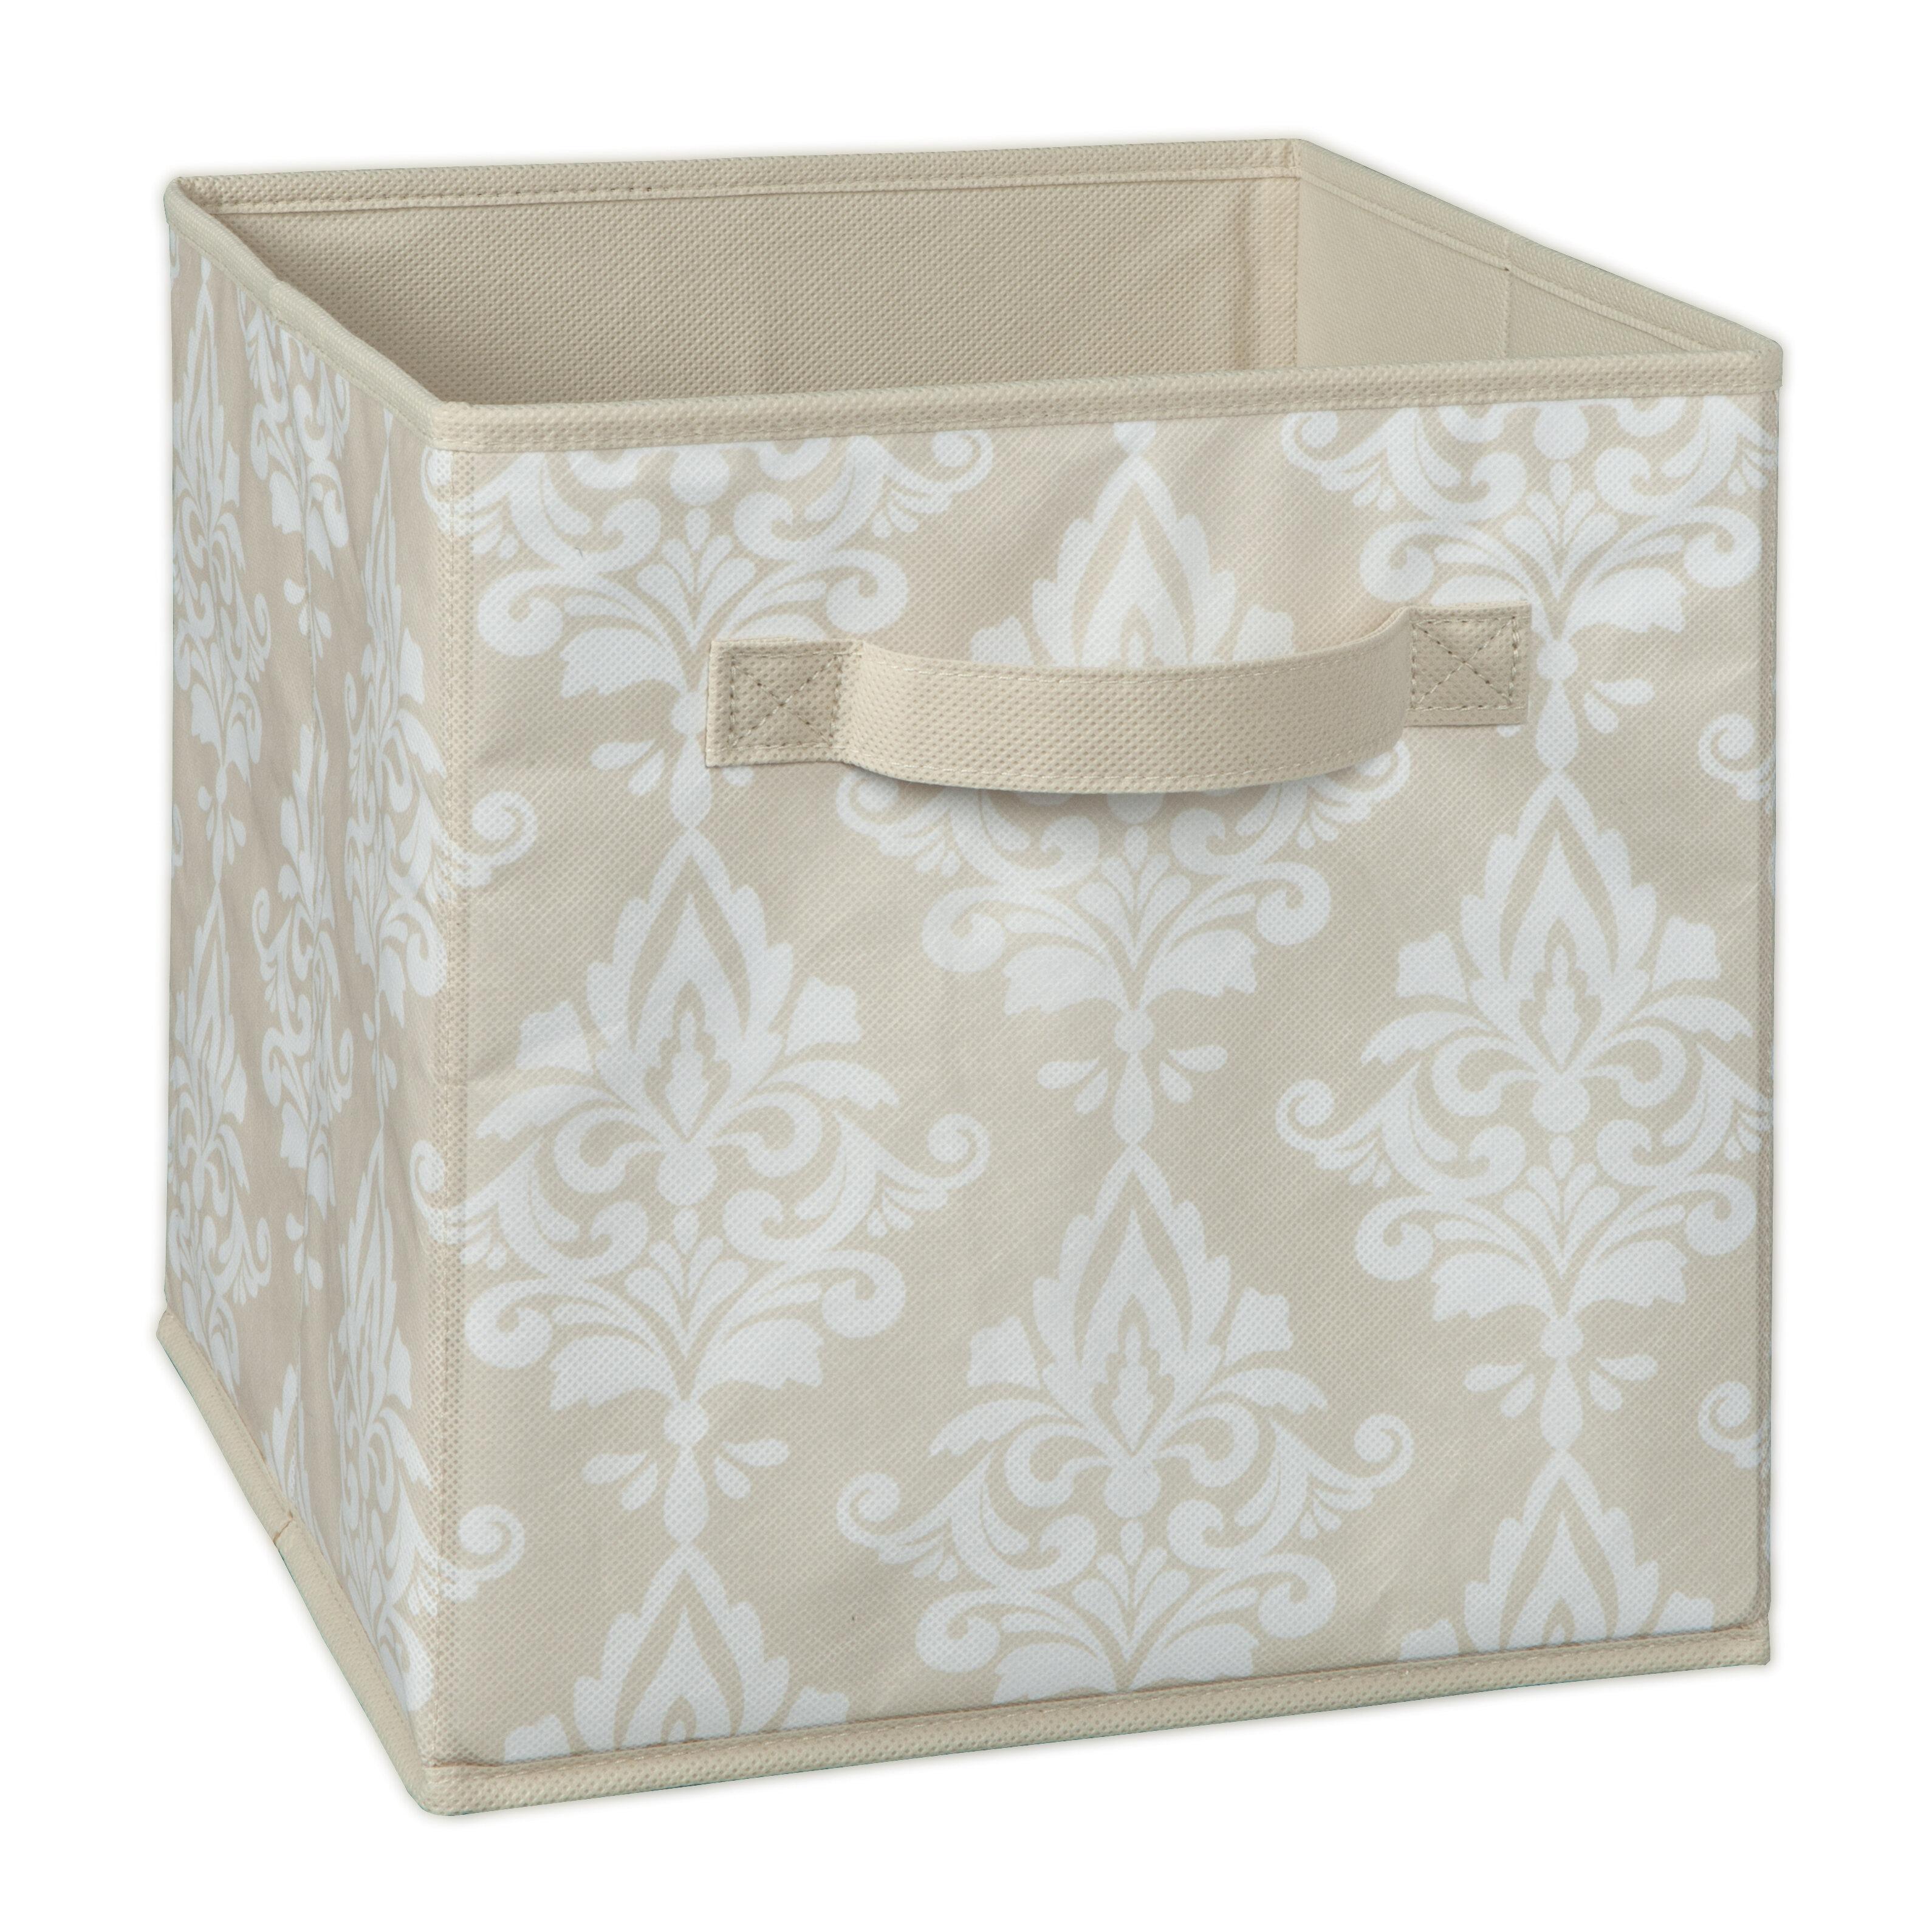 Closetmaid Cubeicals Damask Fabric Storage Bin Reviews Wayfair